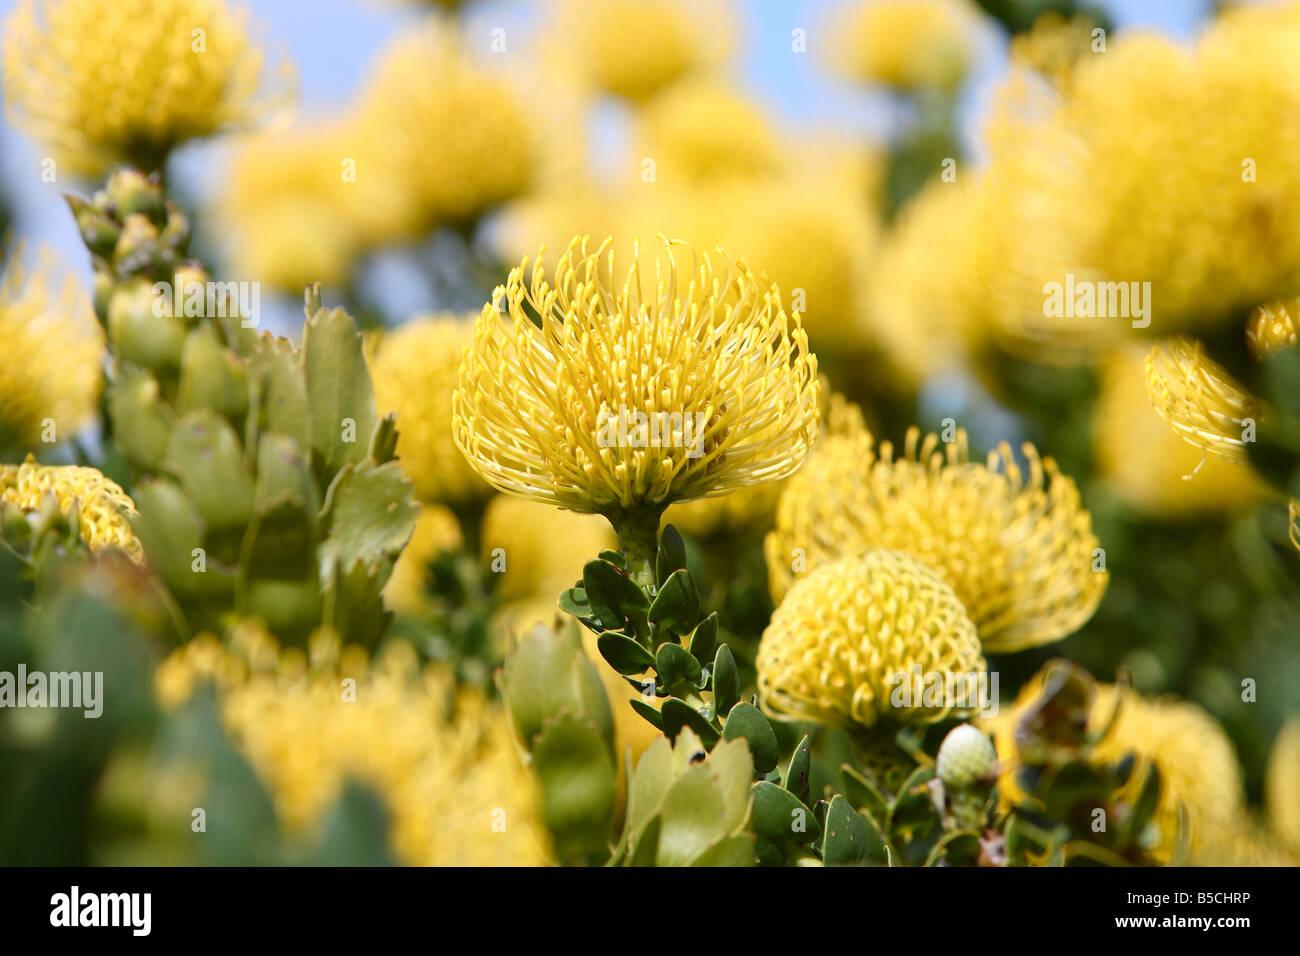 Yellow Bird Pincushion Protea Leucospermum Cordifolium Stock Photo